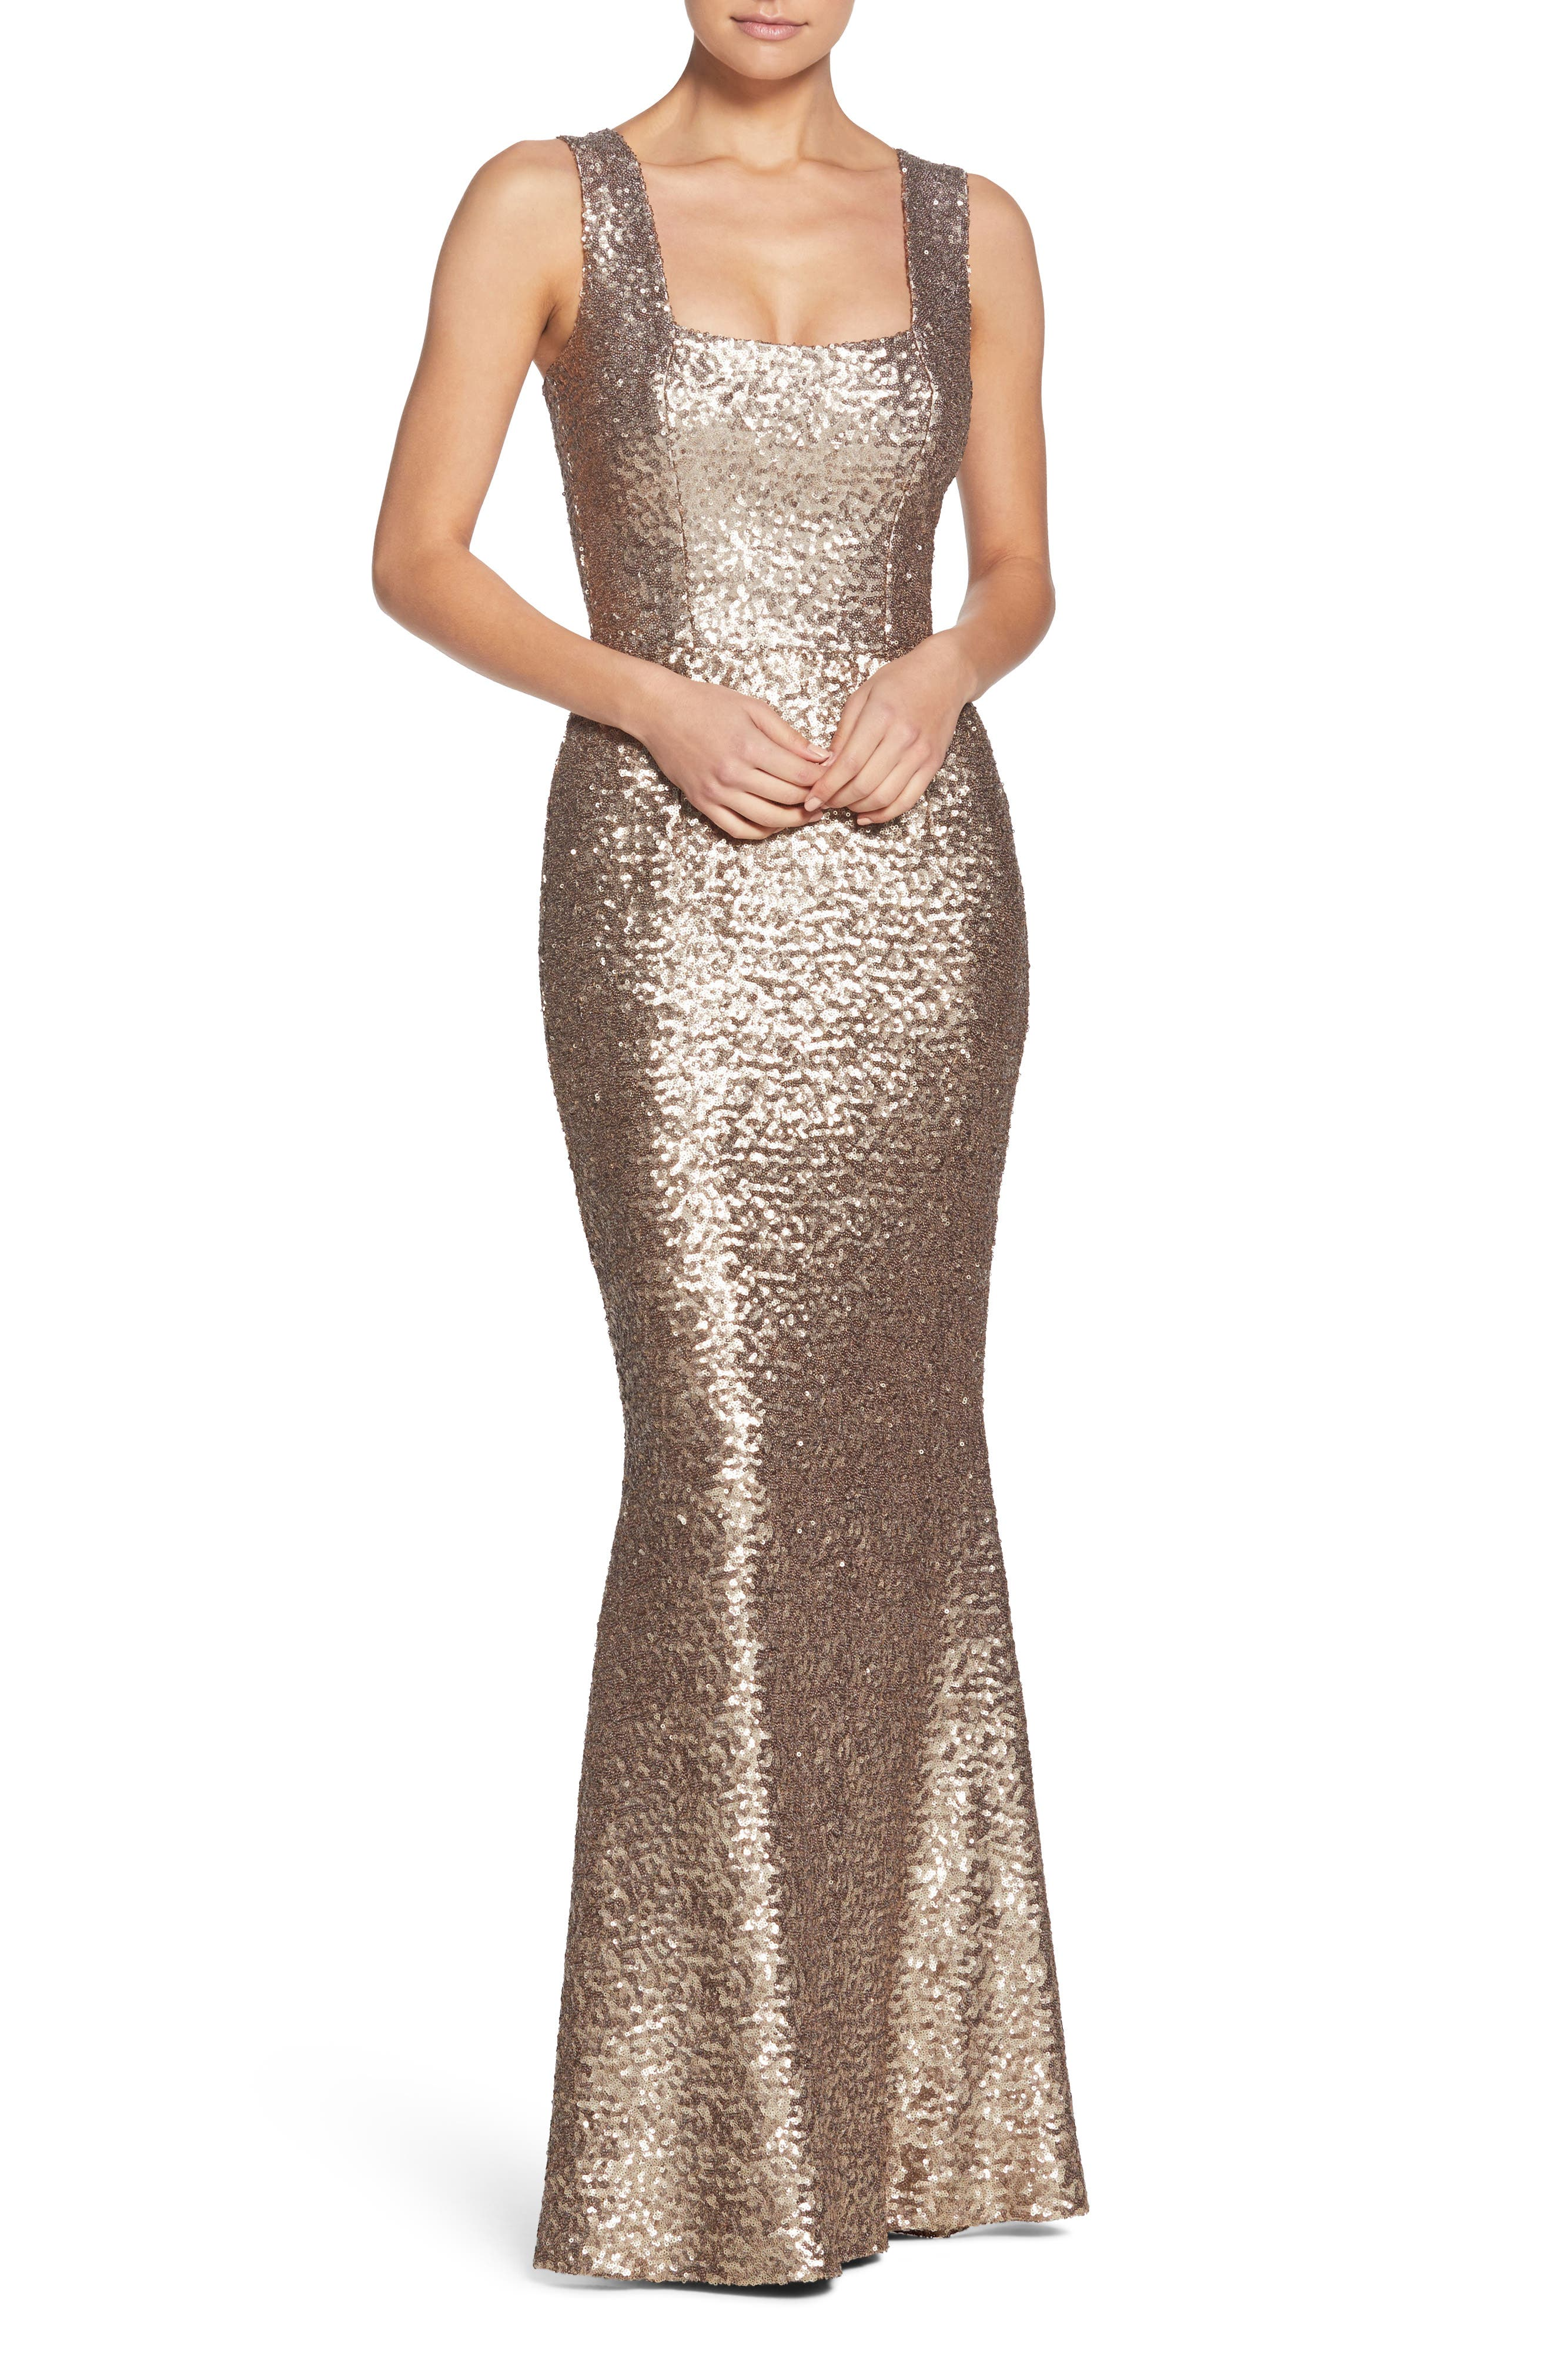 Raven Sequin Gown,                             Main thumbnail 1, color,                             Brass